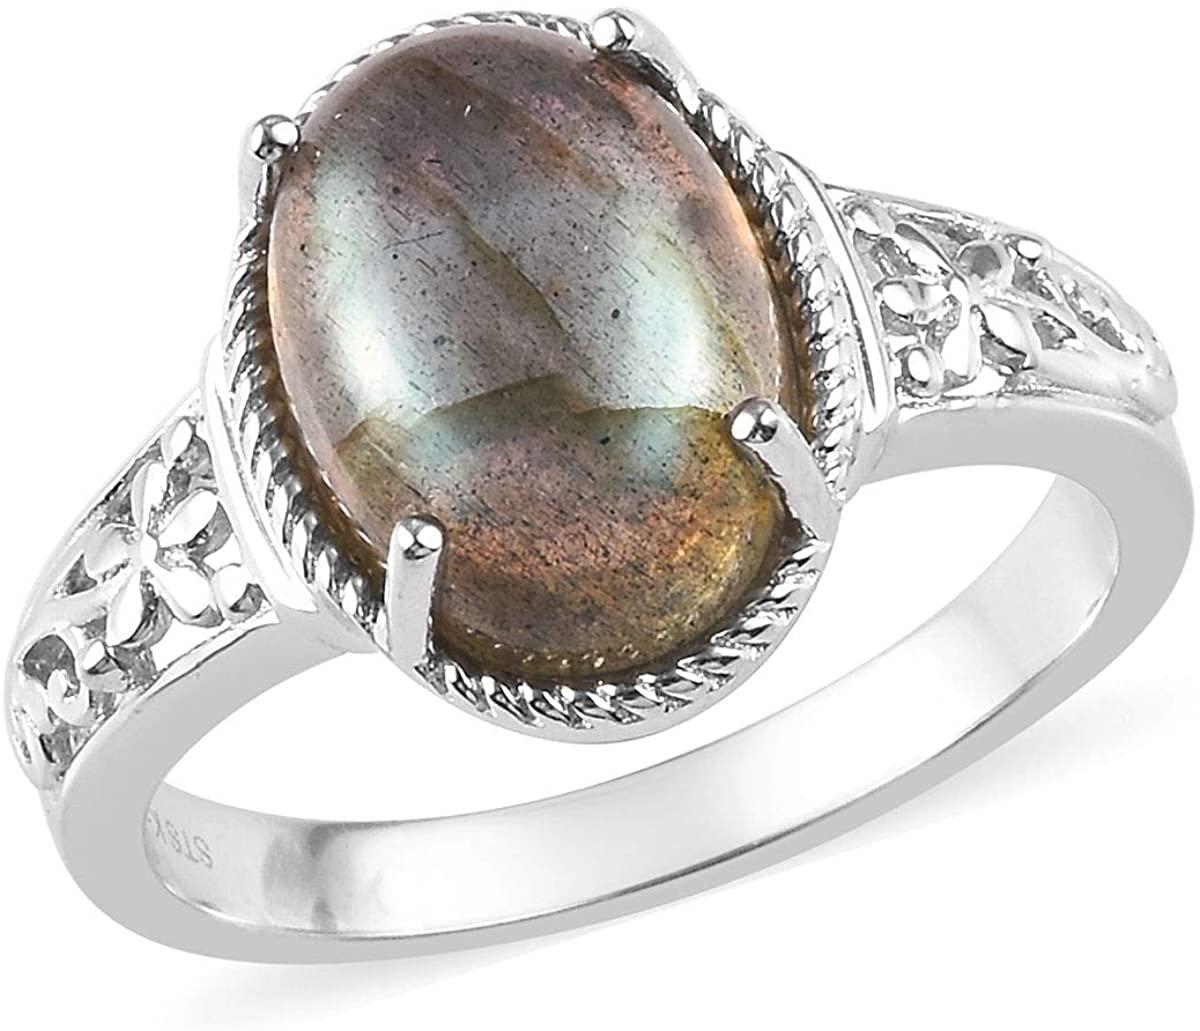 Shop LC Delivering Joy Karis Platinum Plated Oval Labradorite Solitaire Ring Costume Unique Fashion Jewelry for Women Size 7